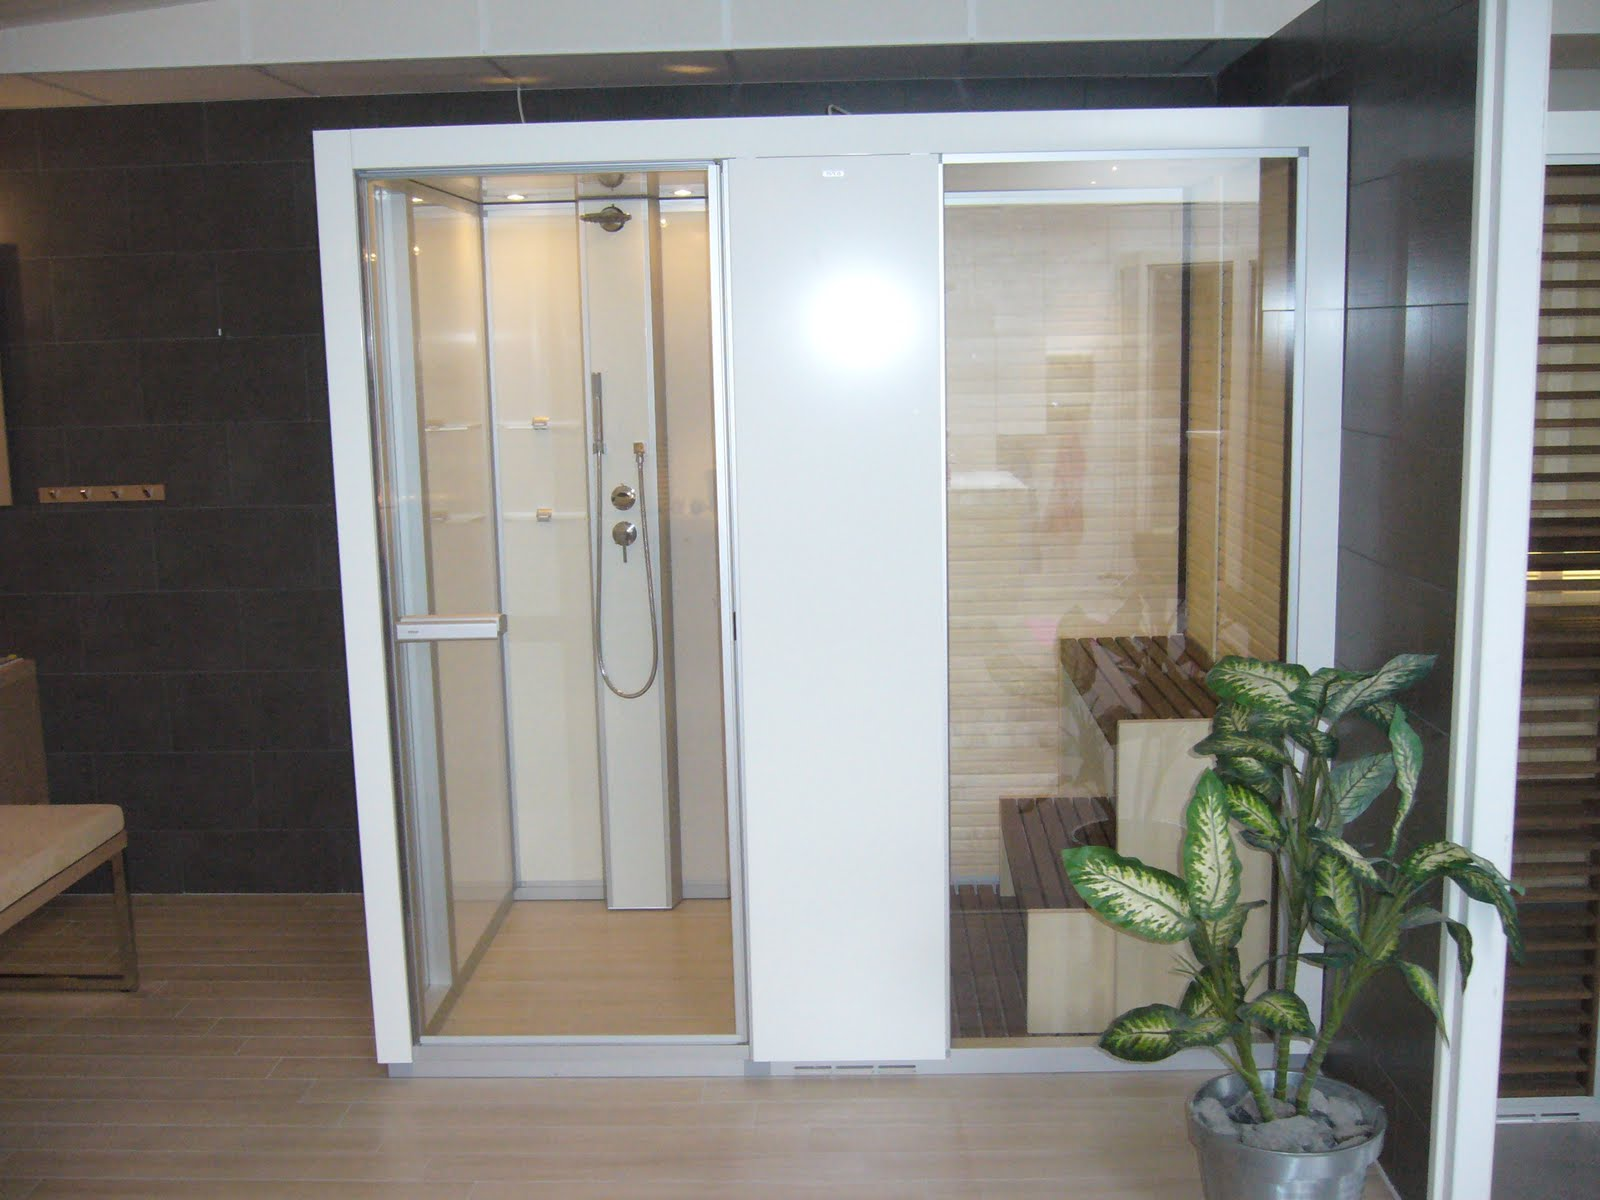 luxury saunas steam rooms by leisurequip ix210s tylo. Black Bedroom Furniture Sets. Home Design Ideas